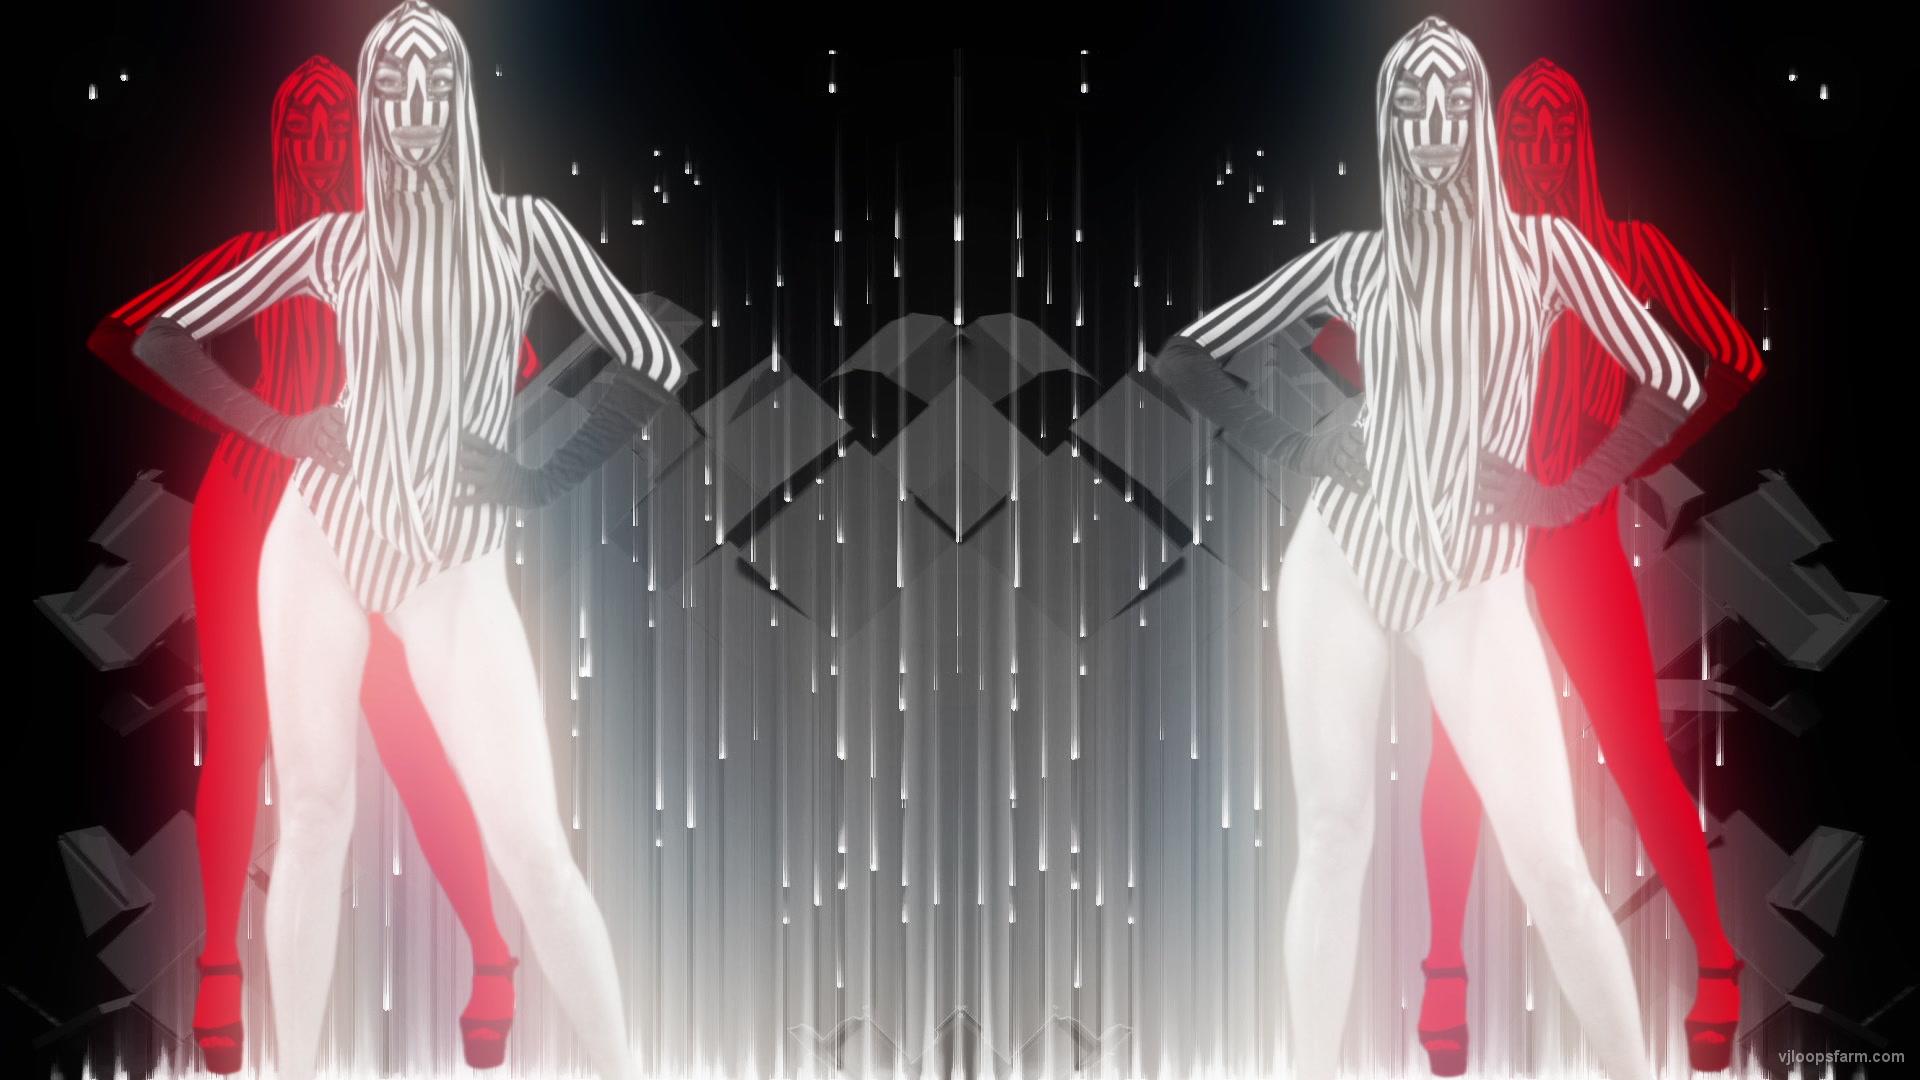 vj video background Dancing-Girls-Background-for-DJ-on-EDM-Beats-Video-Art-VJ-Loop_003